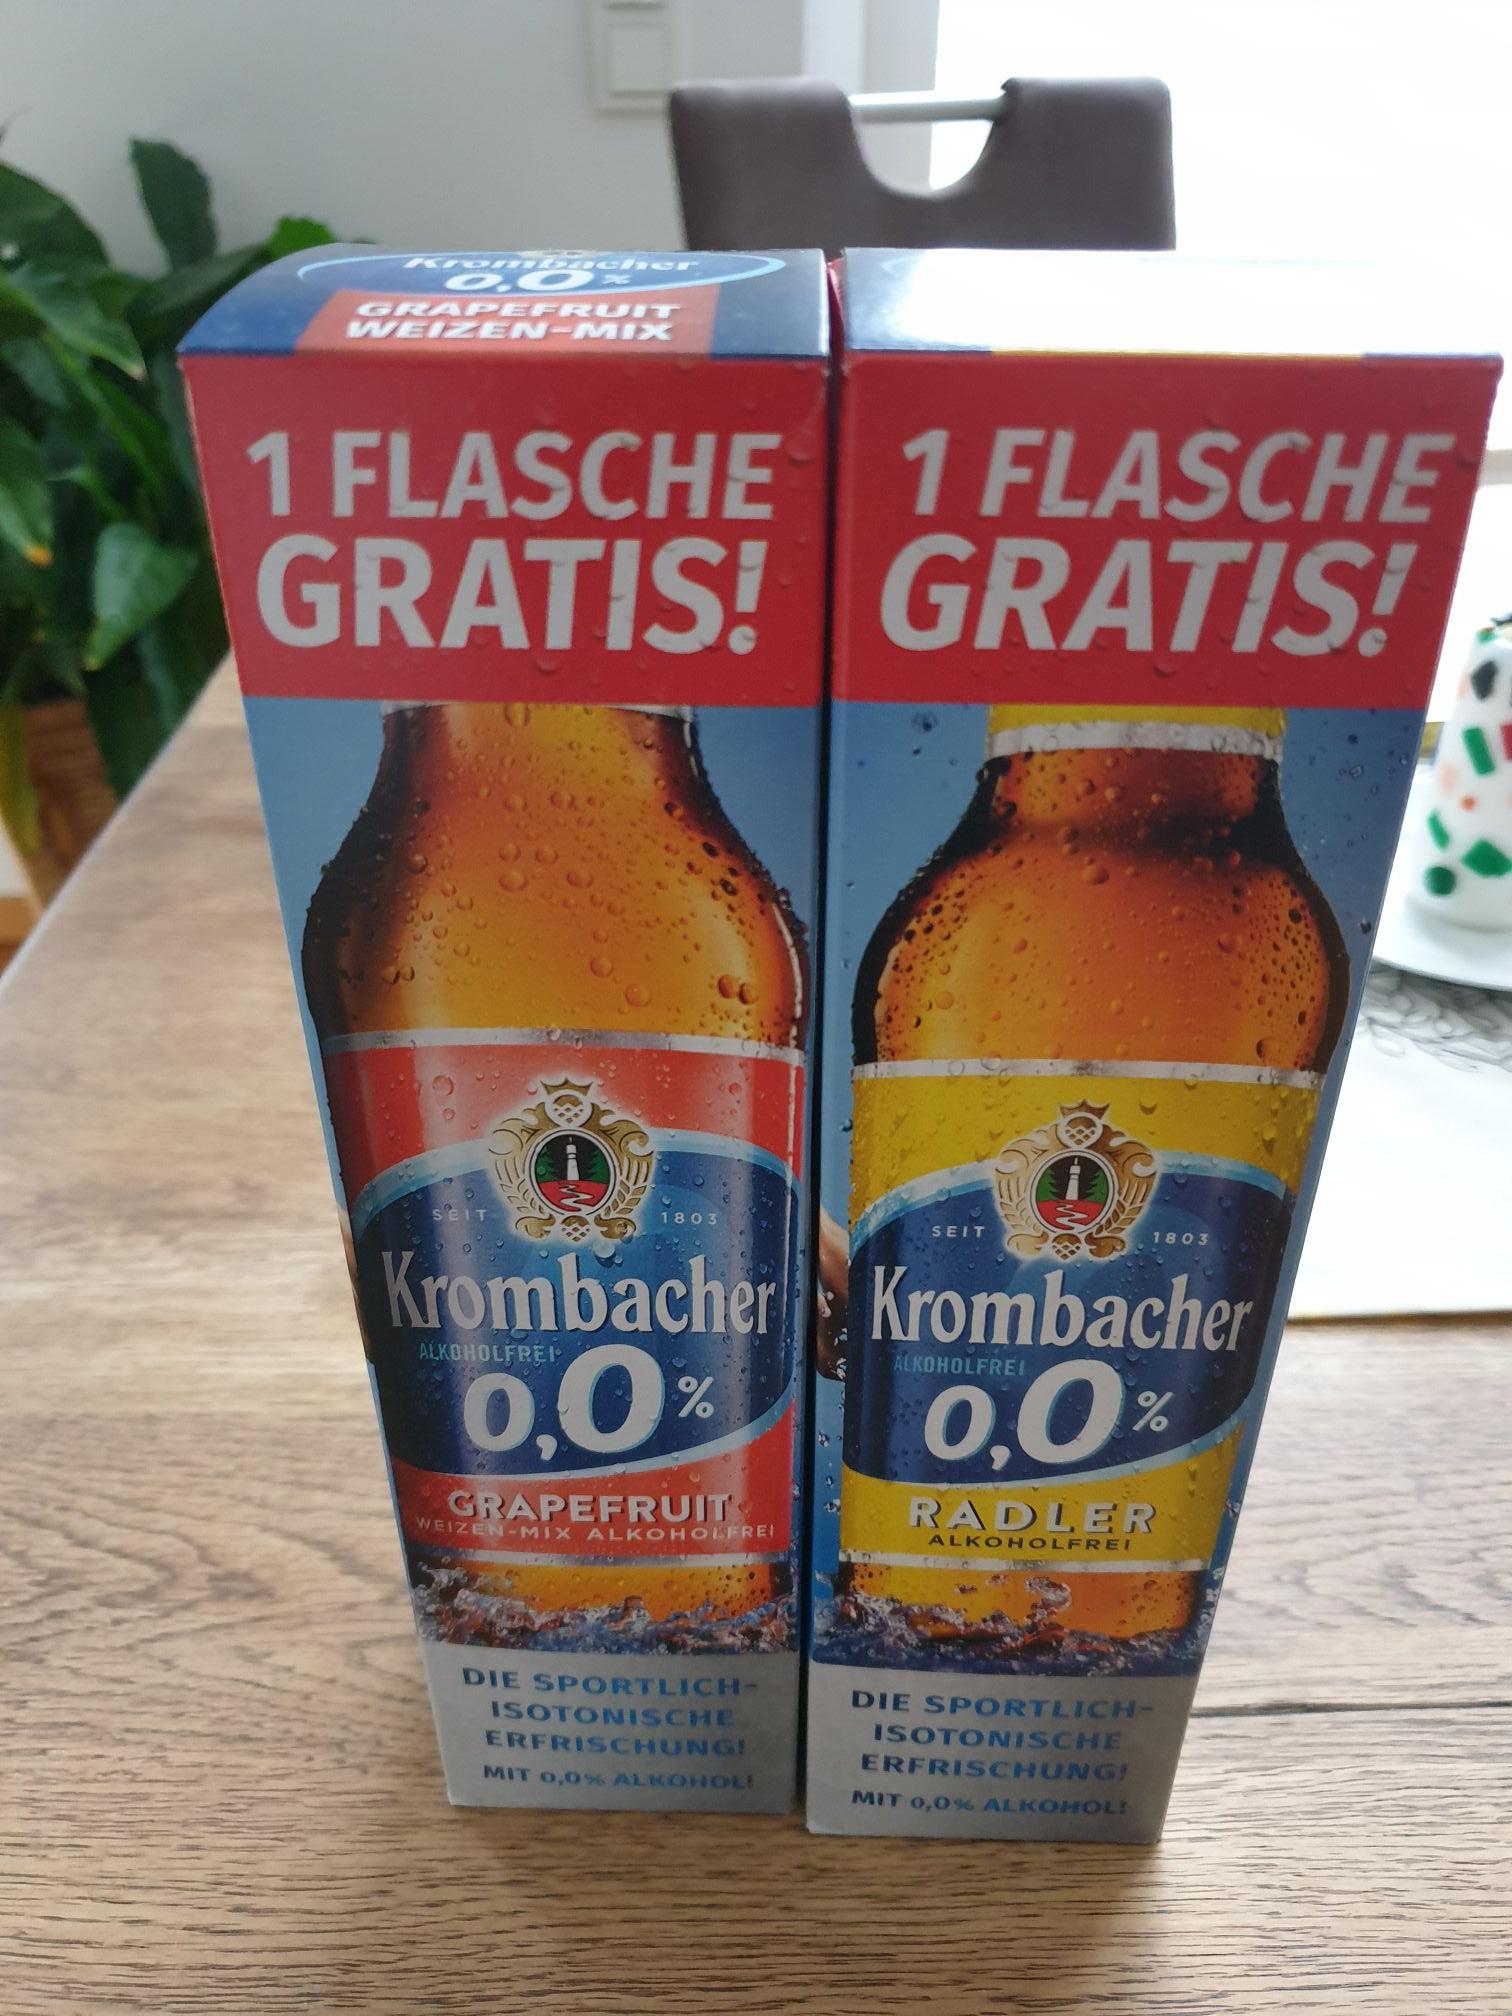 Eine Flasche Krombacher Grapefruit oder Radler gratis (Lokal Ludwigslust)